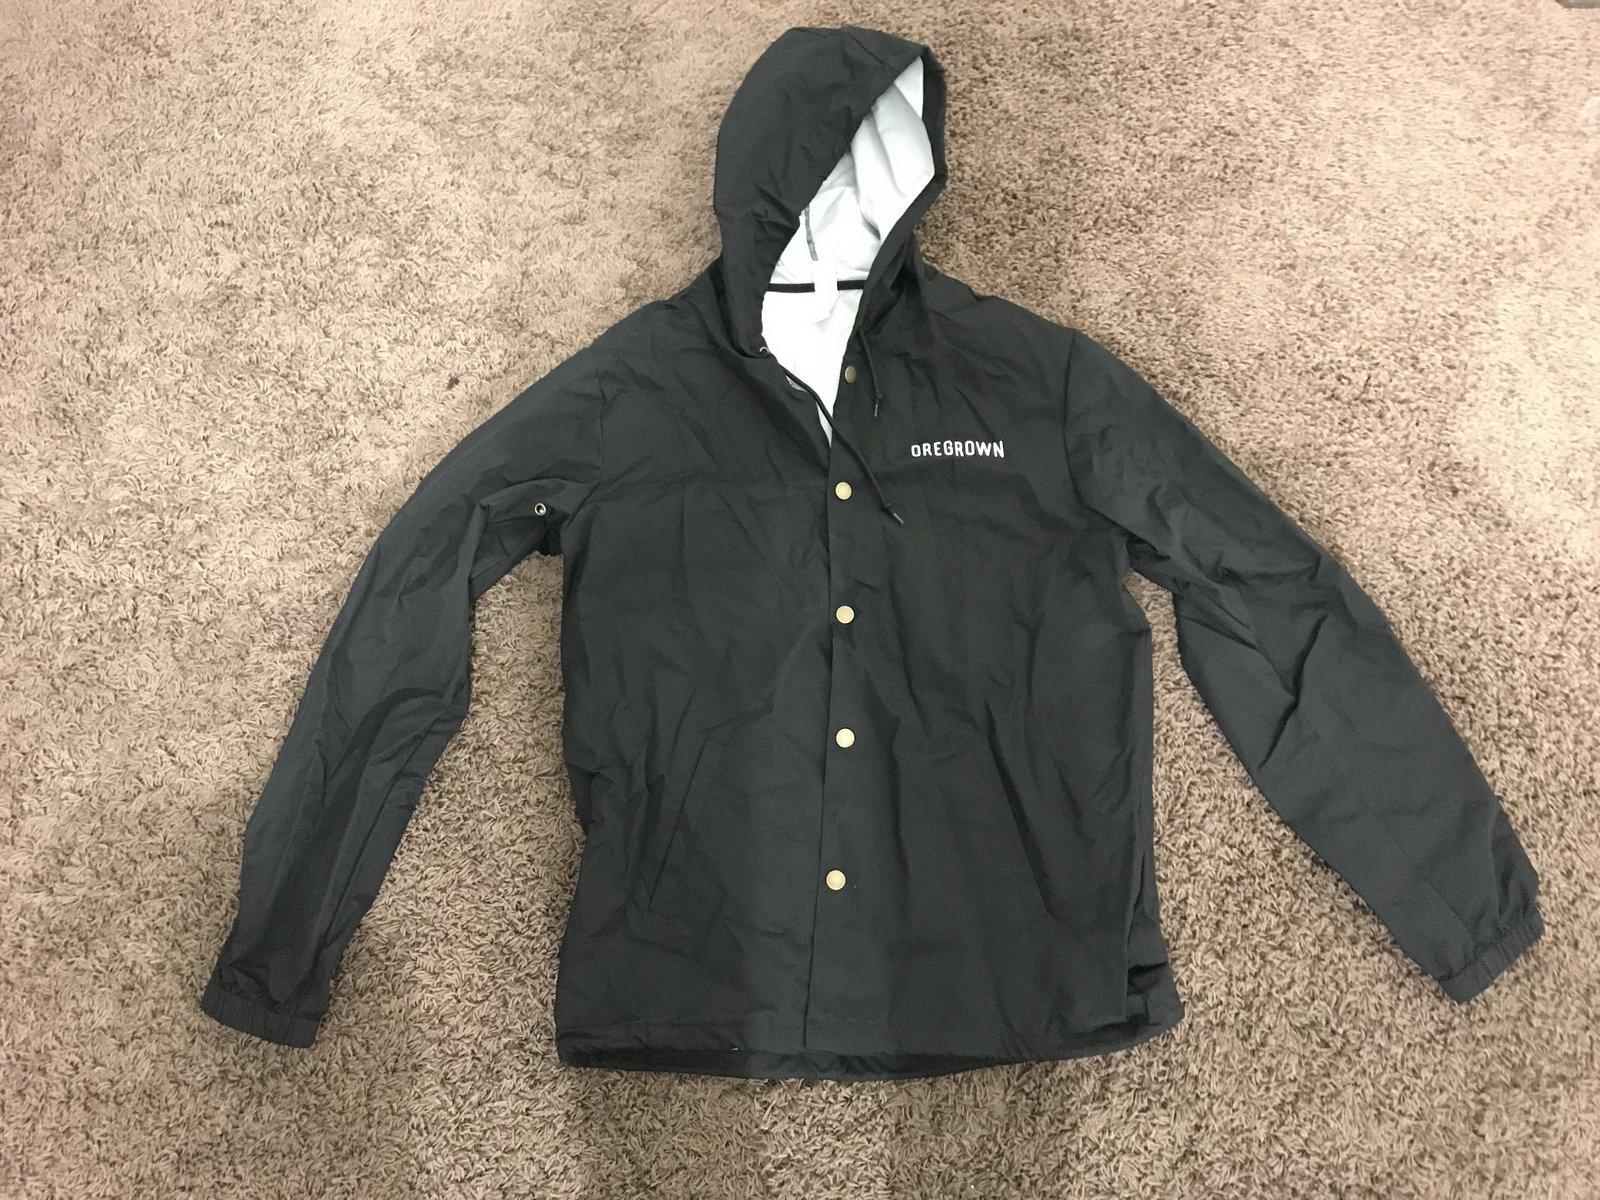 Oregrown Nylon Jacket